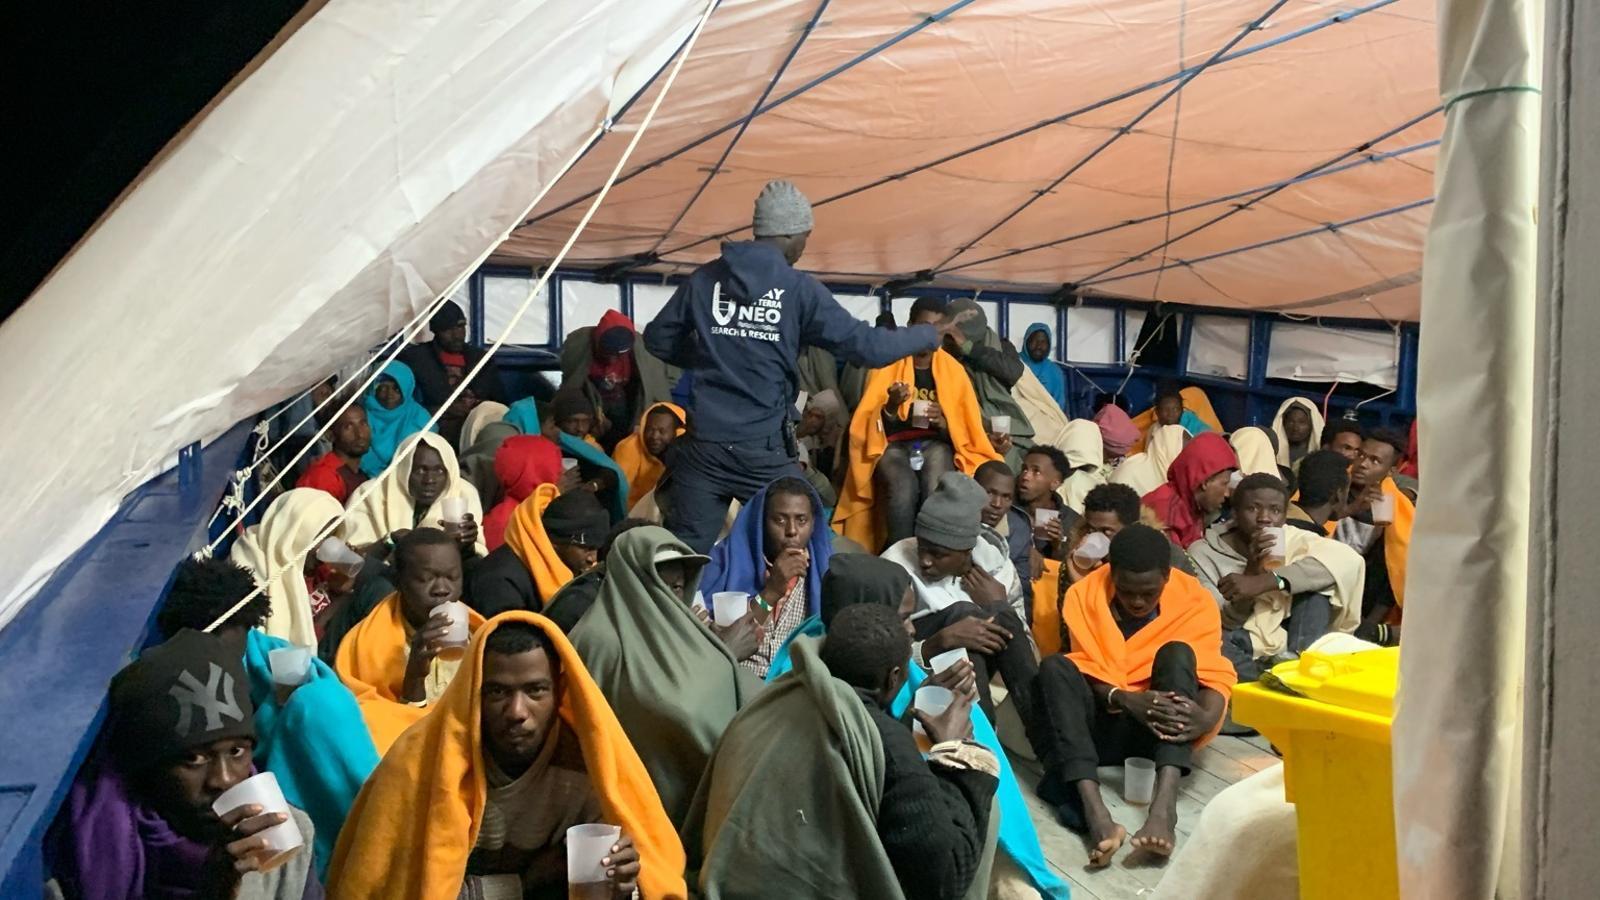 Un miler de migrants fugen en pastera de Líbia en 72 hores